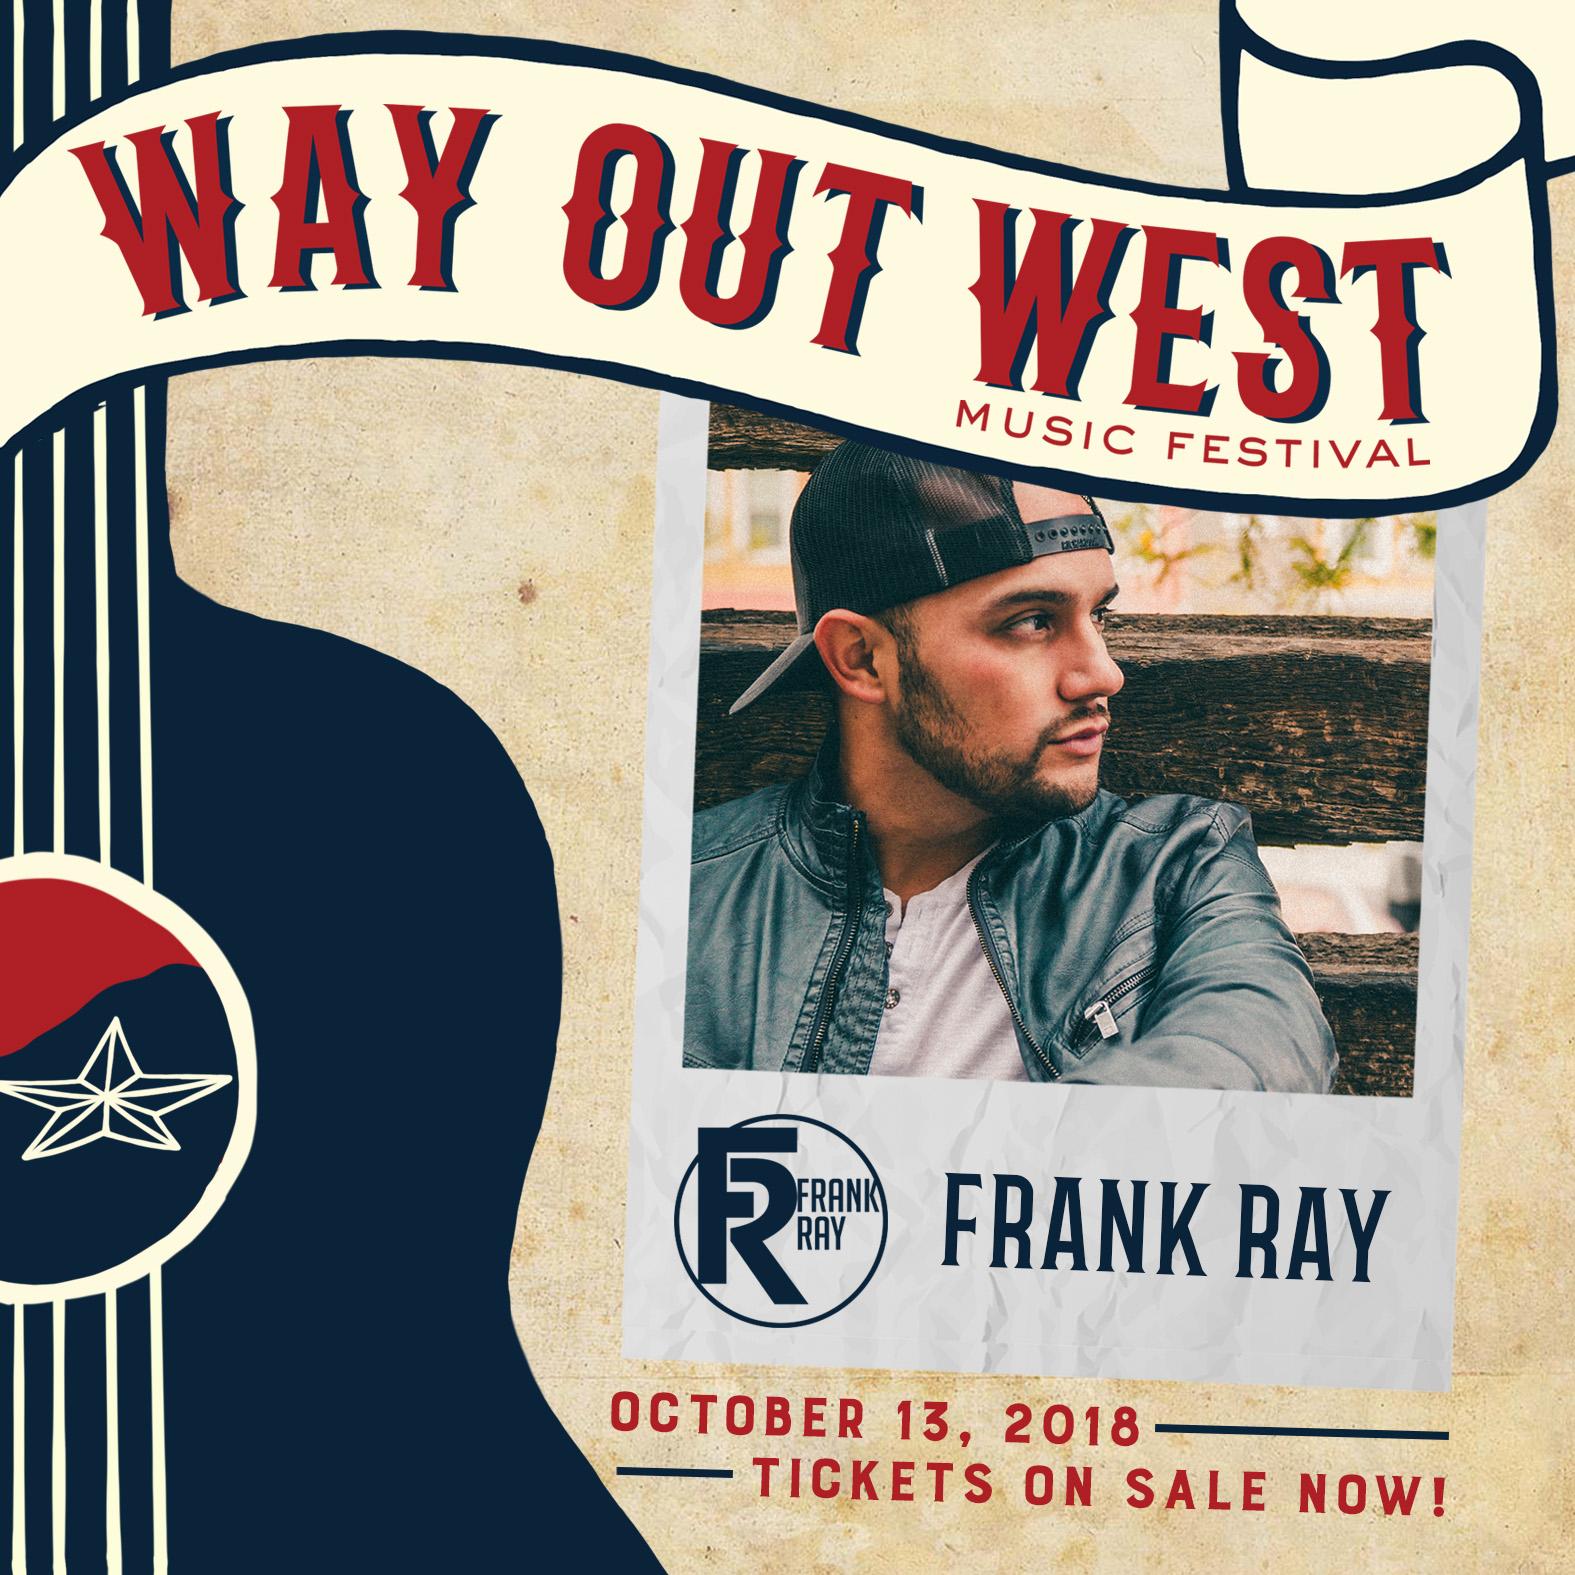 Way out west festival el paso